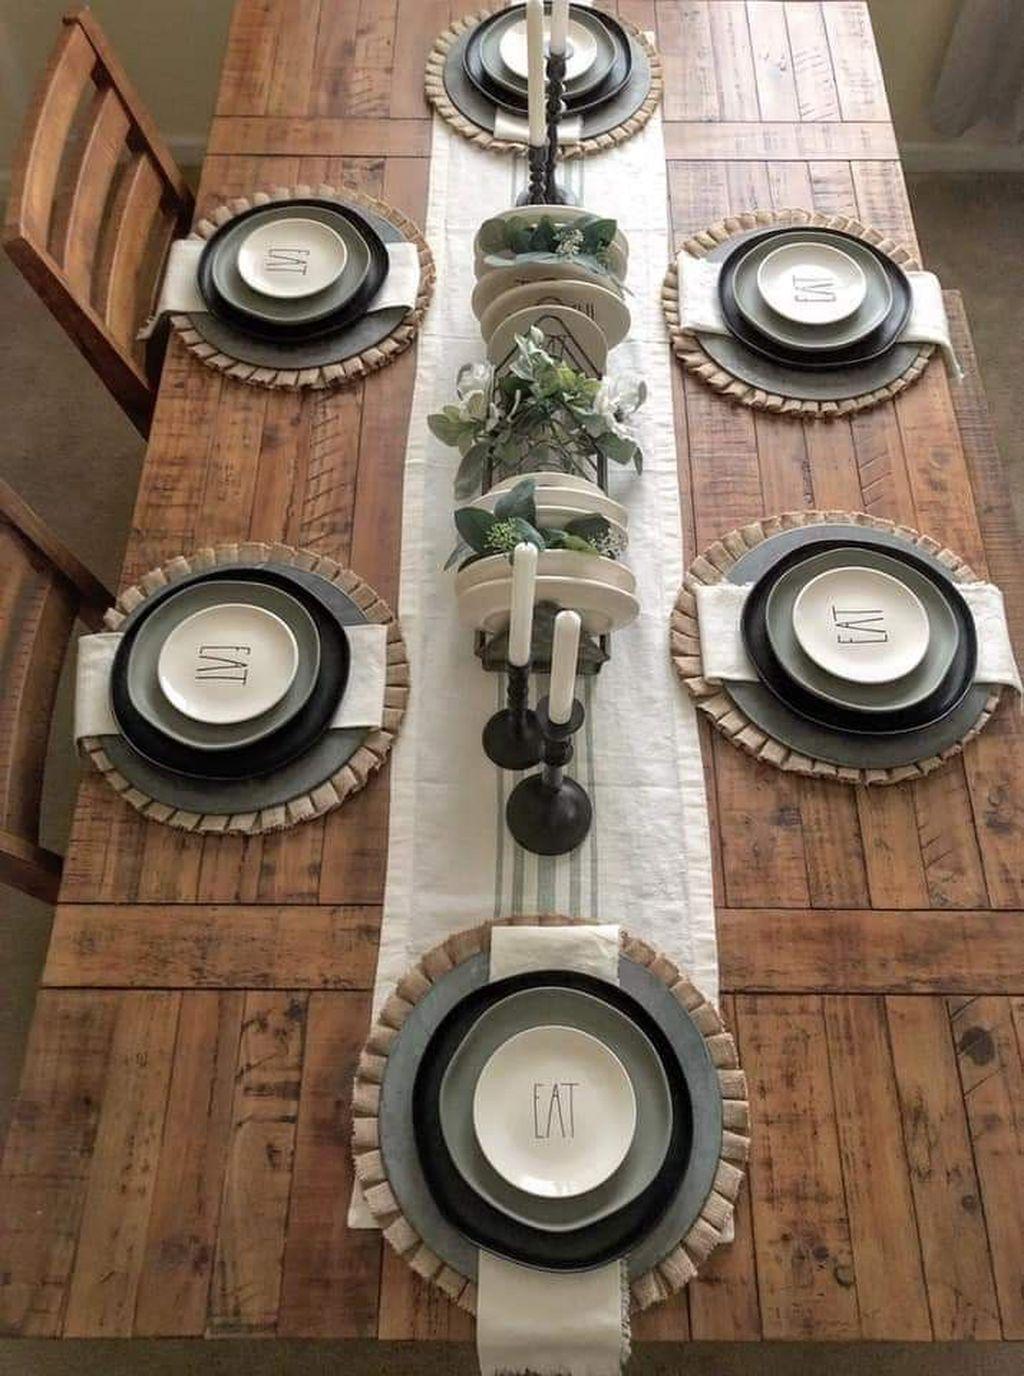 36 Adorable Fall Farmhouse Dining Room Decor Ideas#adorable #decor #dining #fall #farmhouse #ideas #room